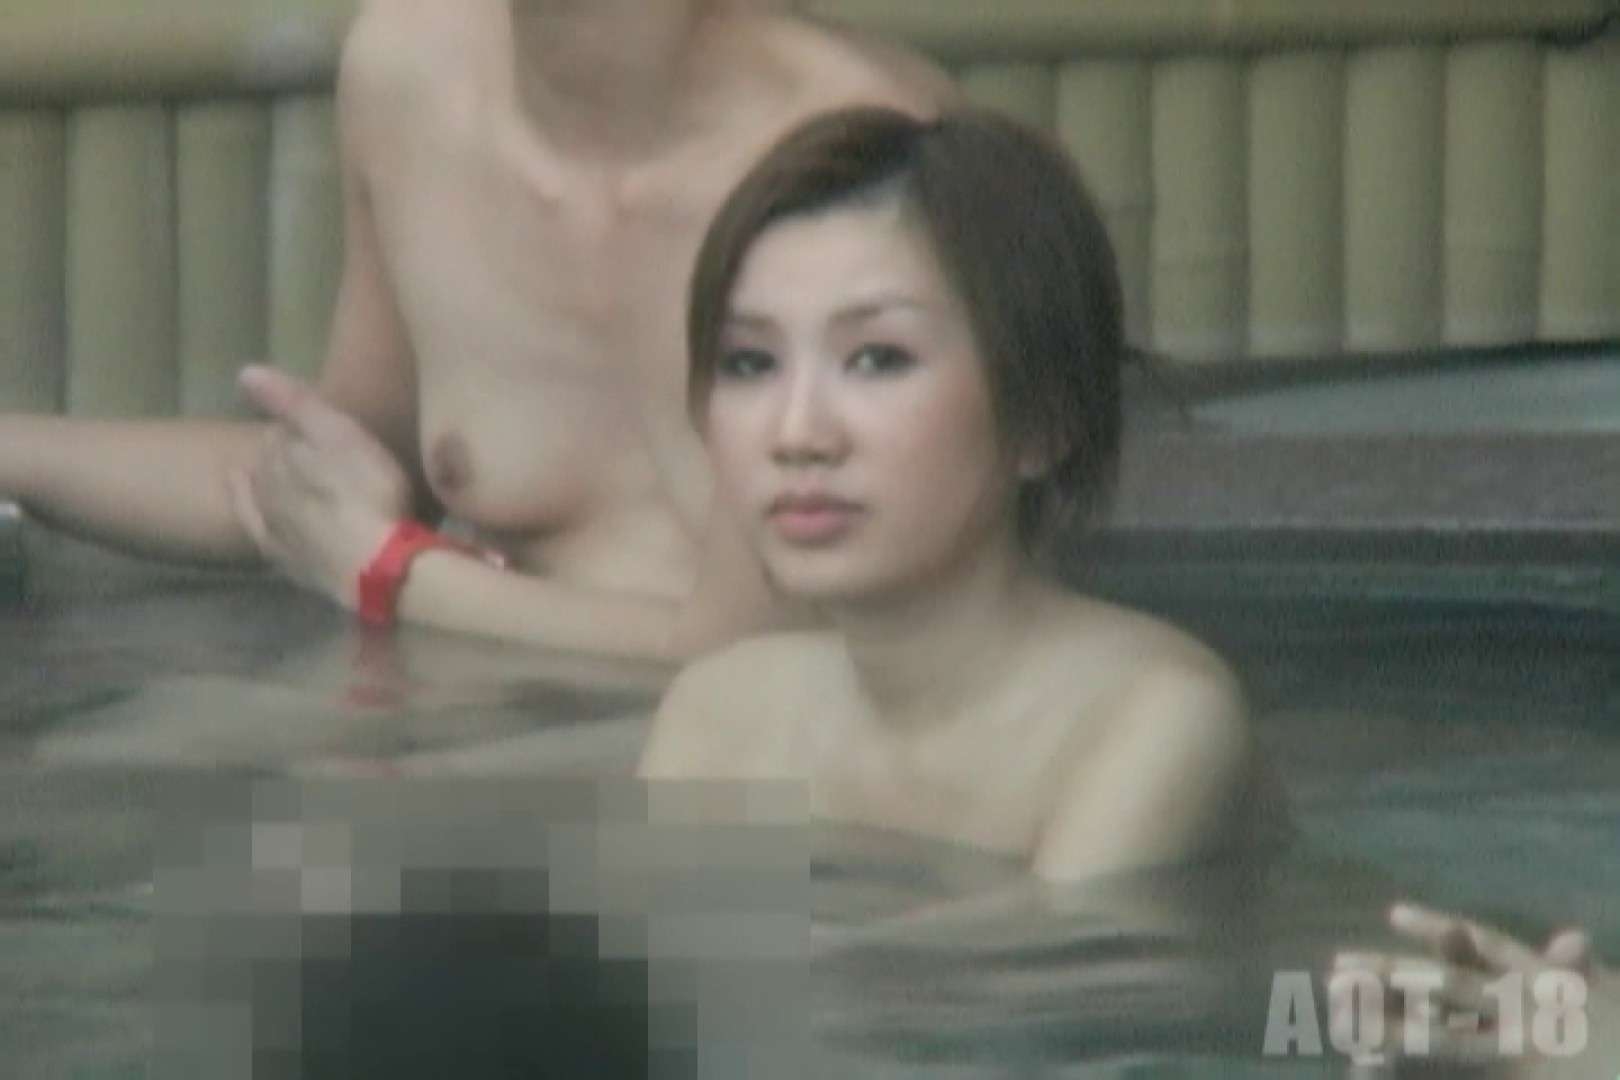 Aquaな露天風呂Vol.857 0   0  91連発 53